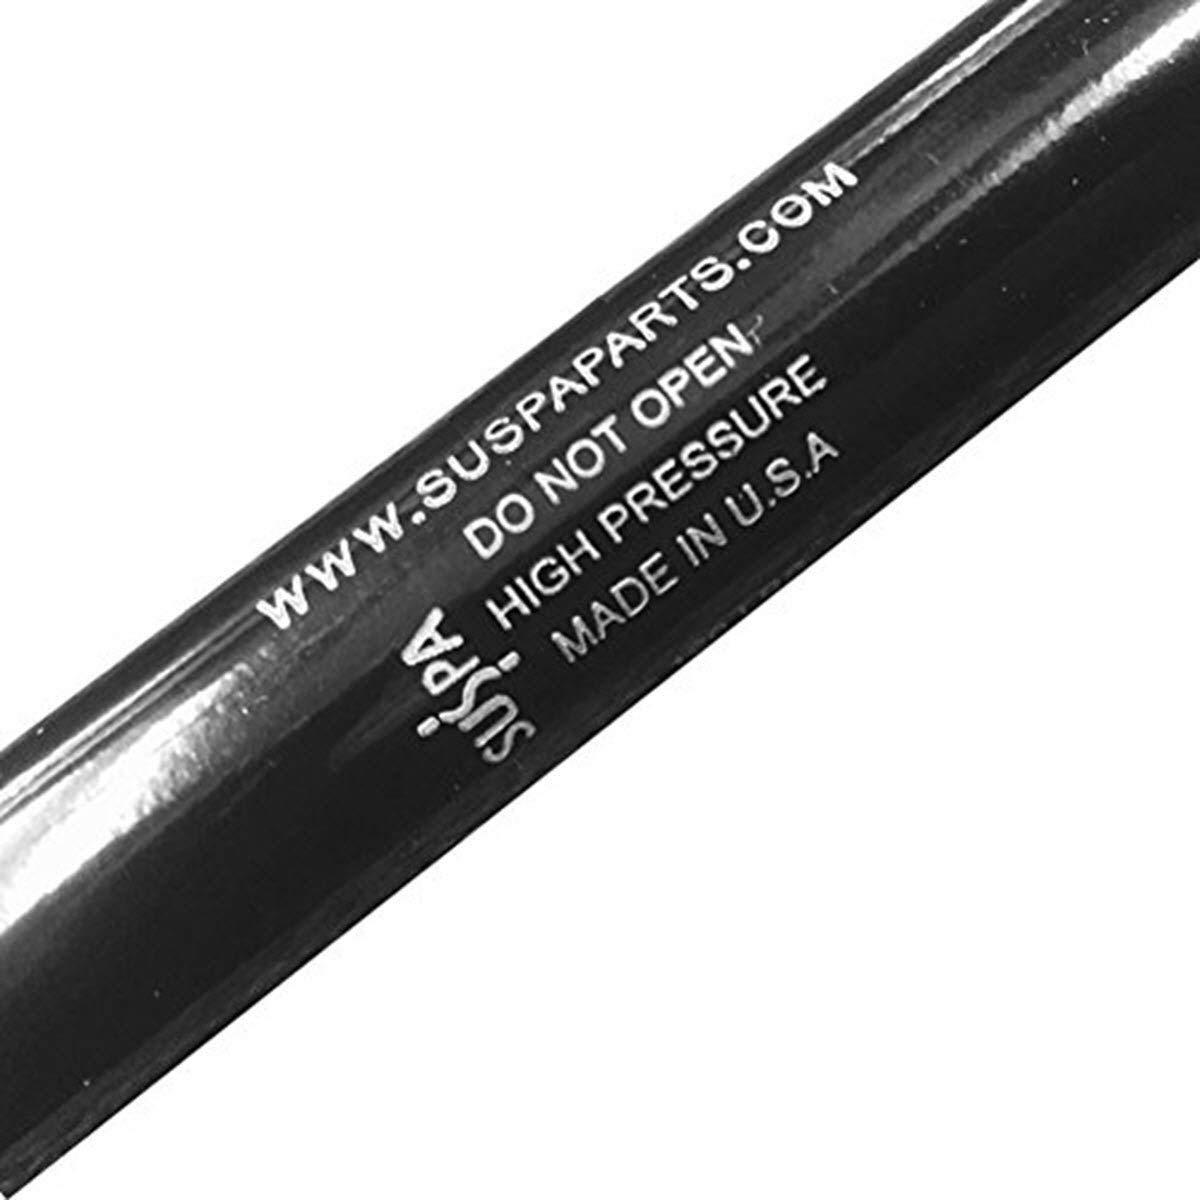 "Suspa C16-06874 C1606874 17"" Gas Prop, Quantity (2), Force 40 Lbs Per Prop, Force Per Set 80 Lbs, Camper Rear Window, Tonneau Cover Lift Supports, Struts, Made in USA"